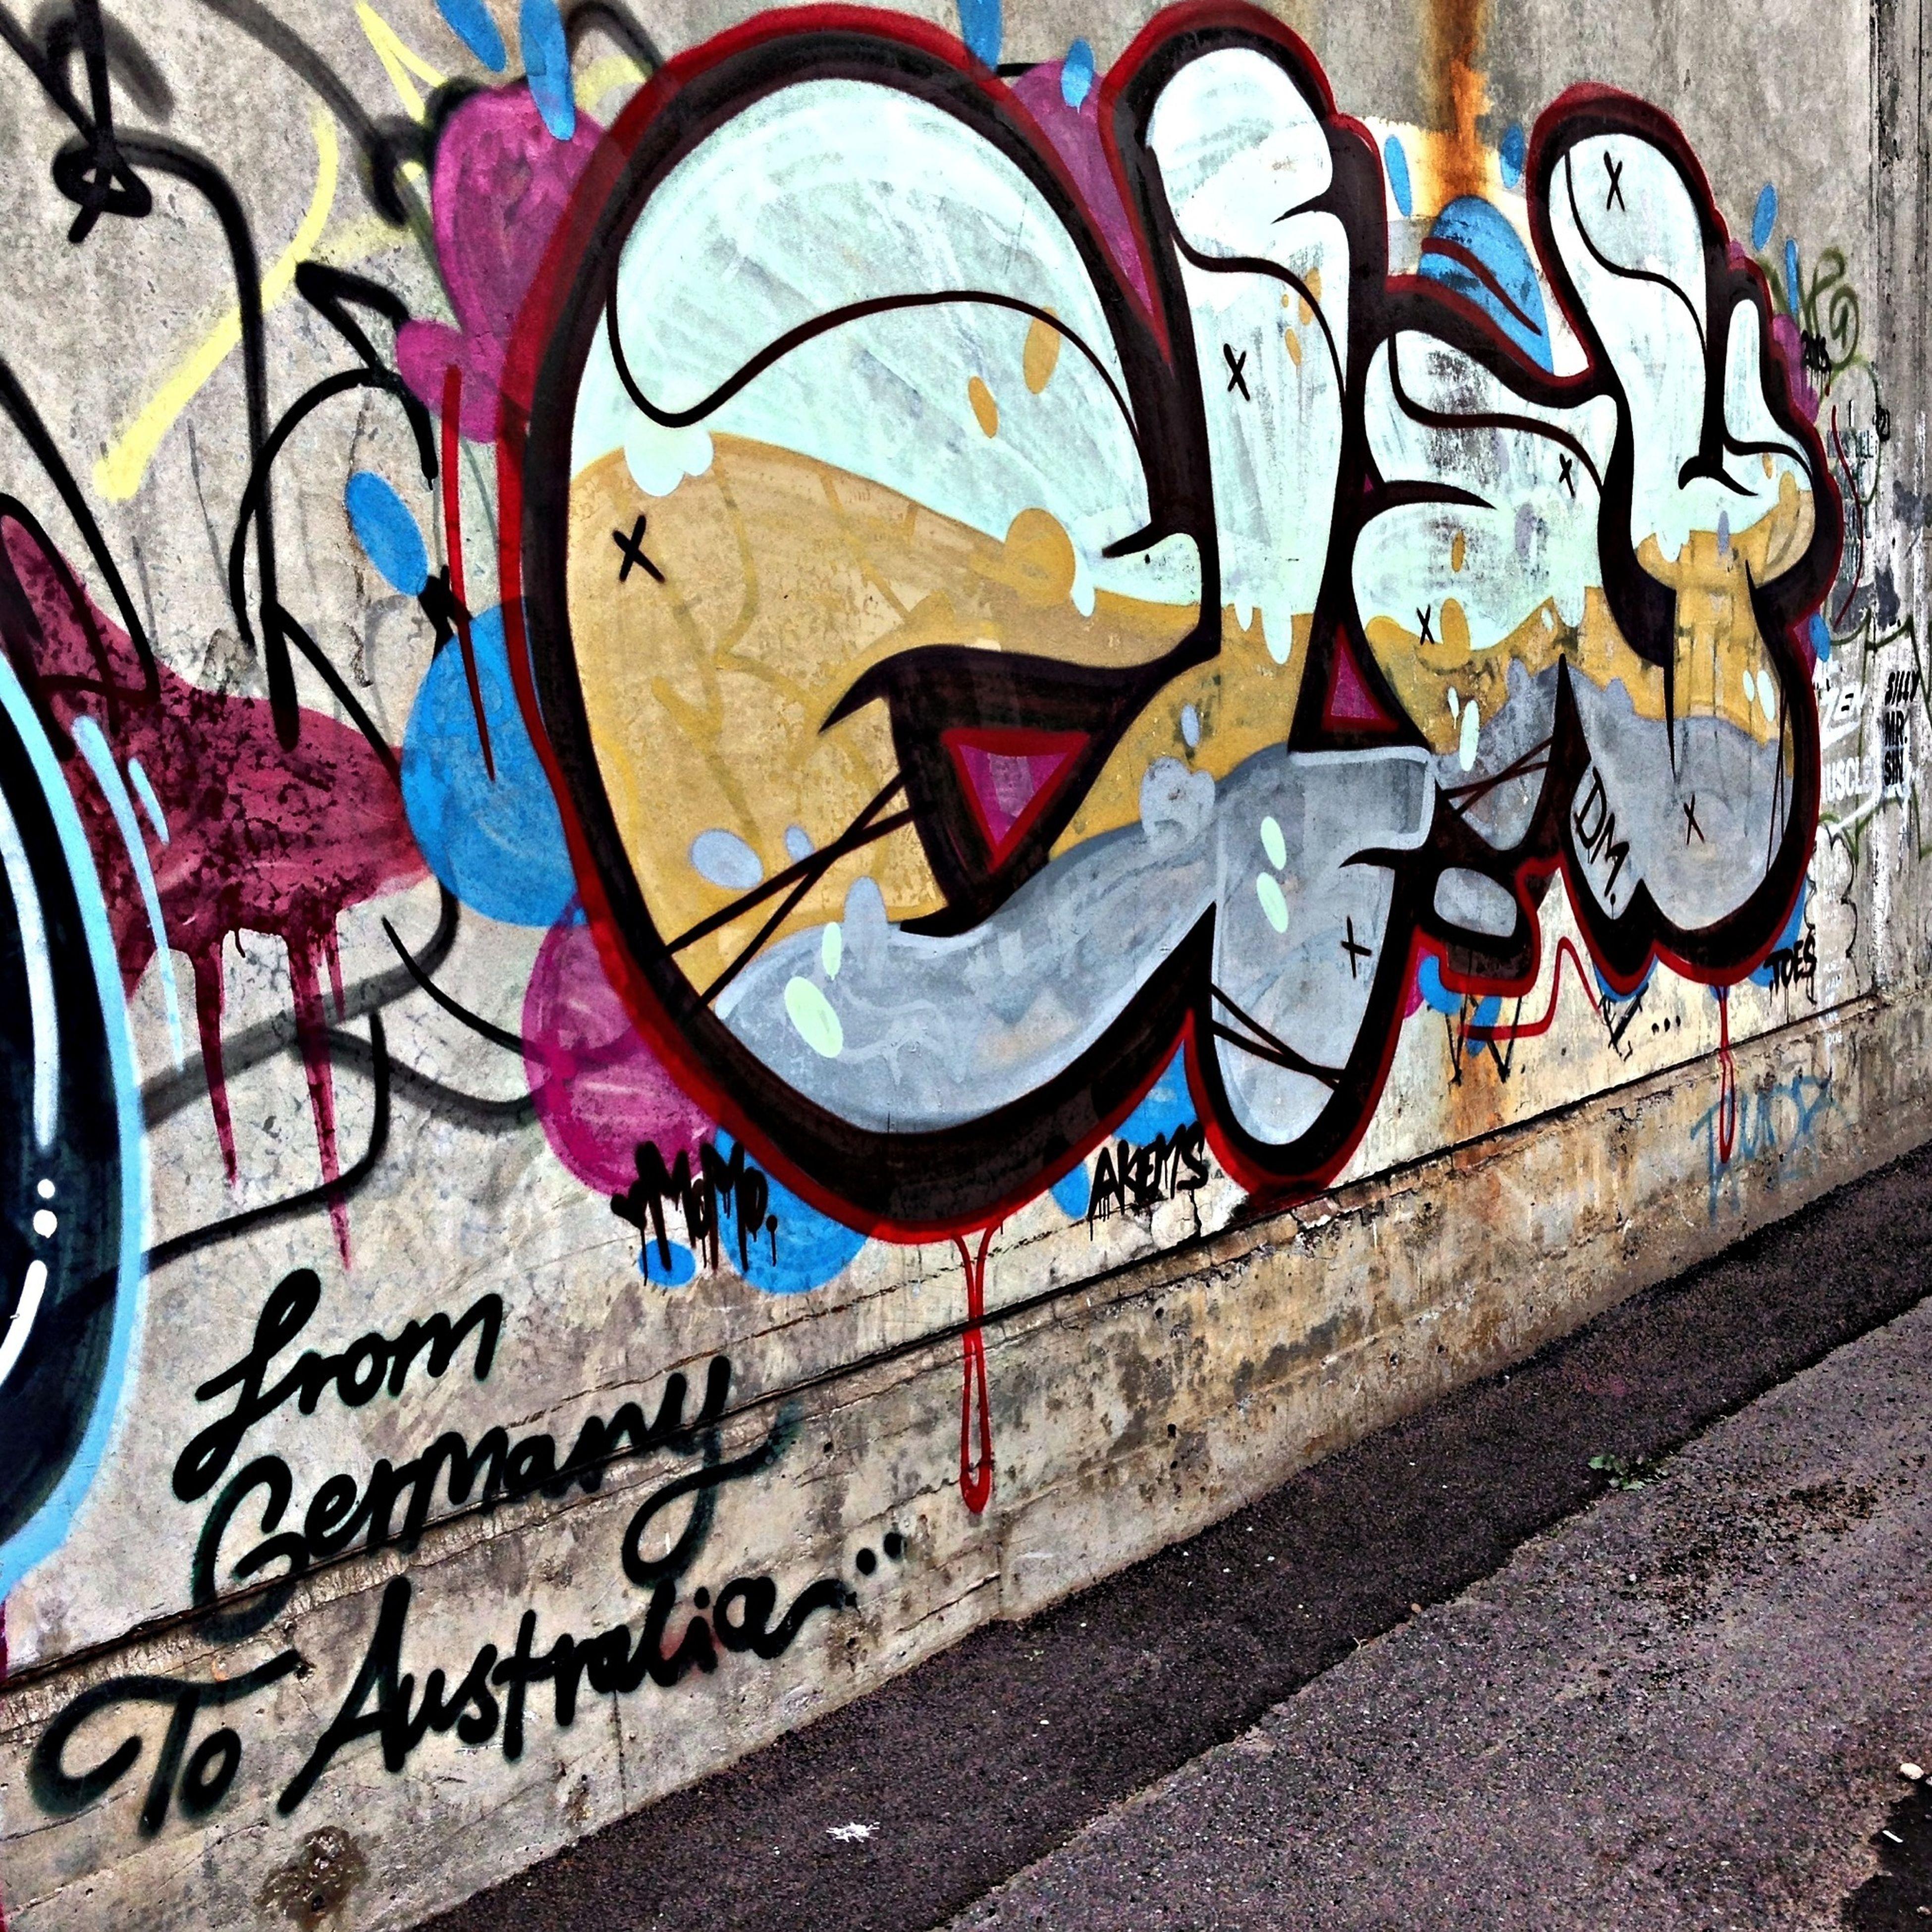 graffiti, creativity, art, art and craft, text, wall - building feature, built structure, architecture, street art, western script, building exterior, multi colored, communication, mural, design, wall, human representation, vandalism, pattern, day